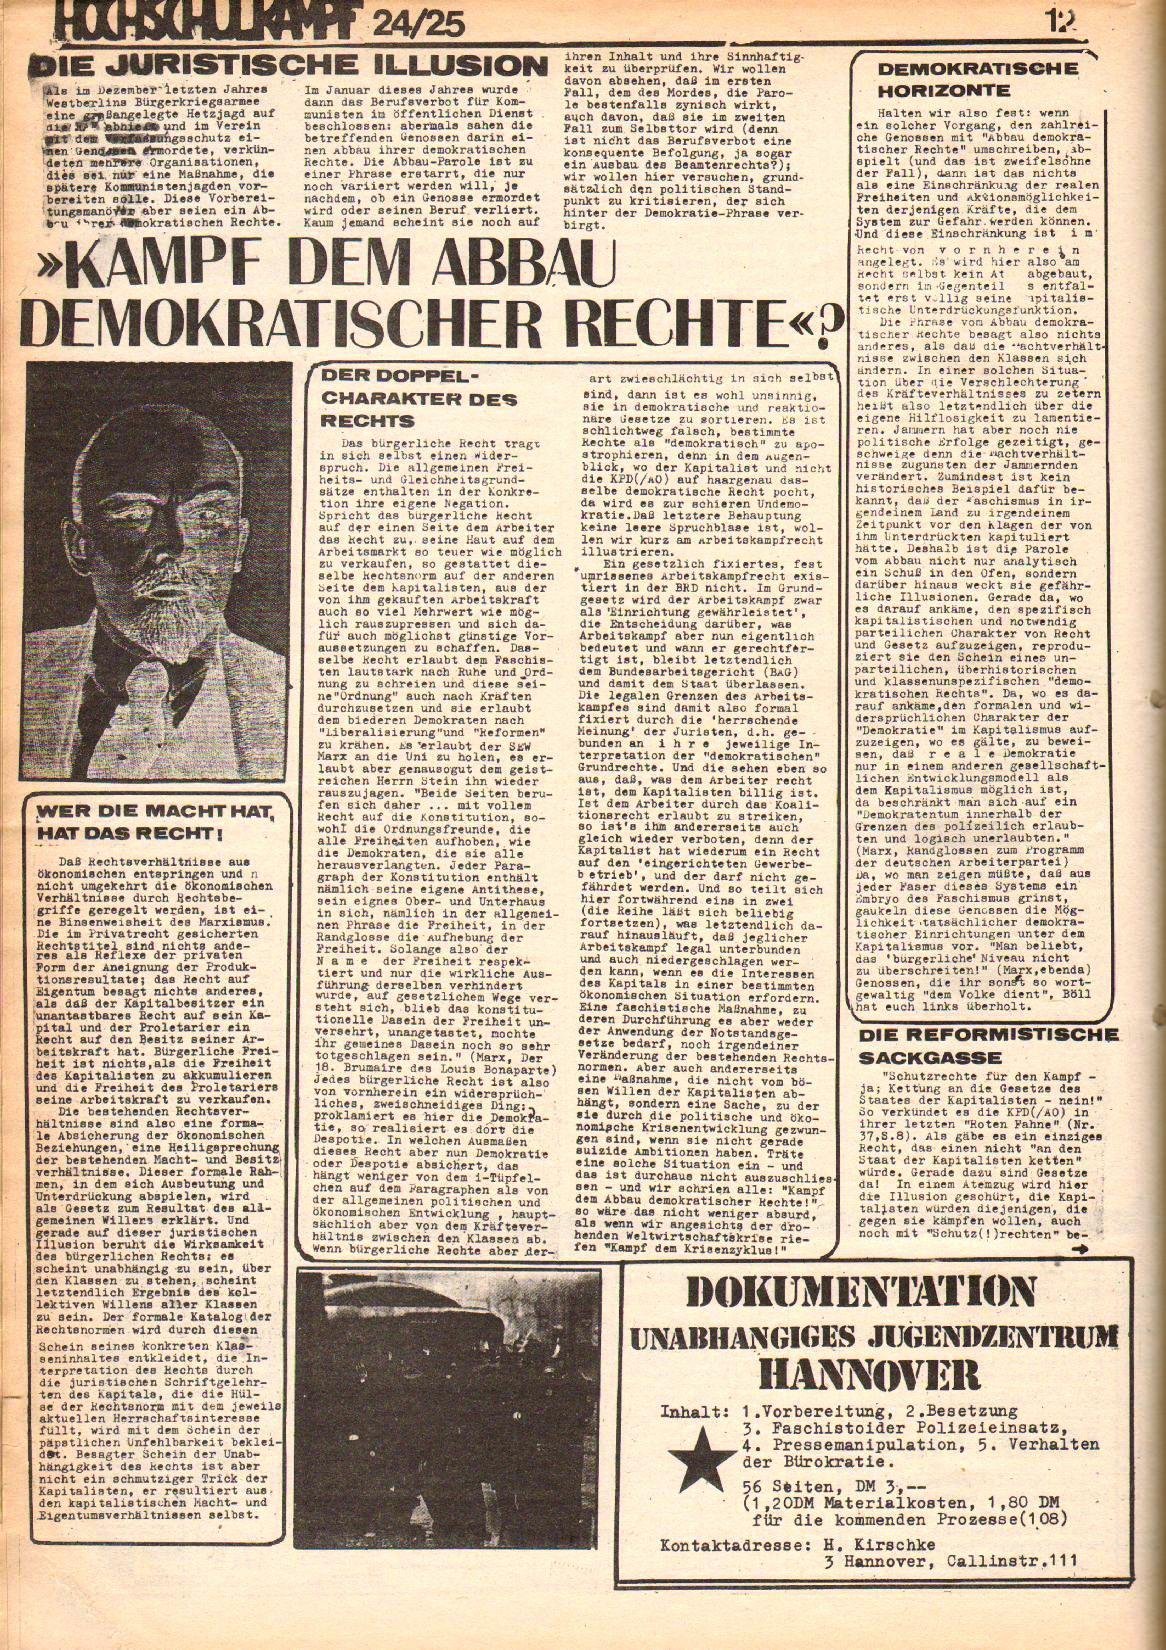 Berlin_Hochschulkampf_1971_24_12